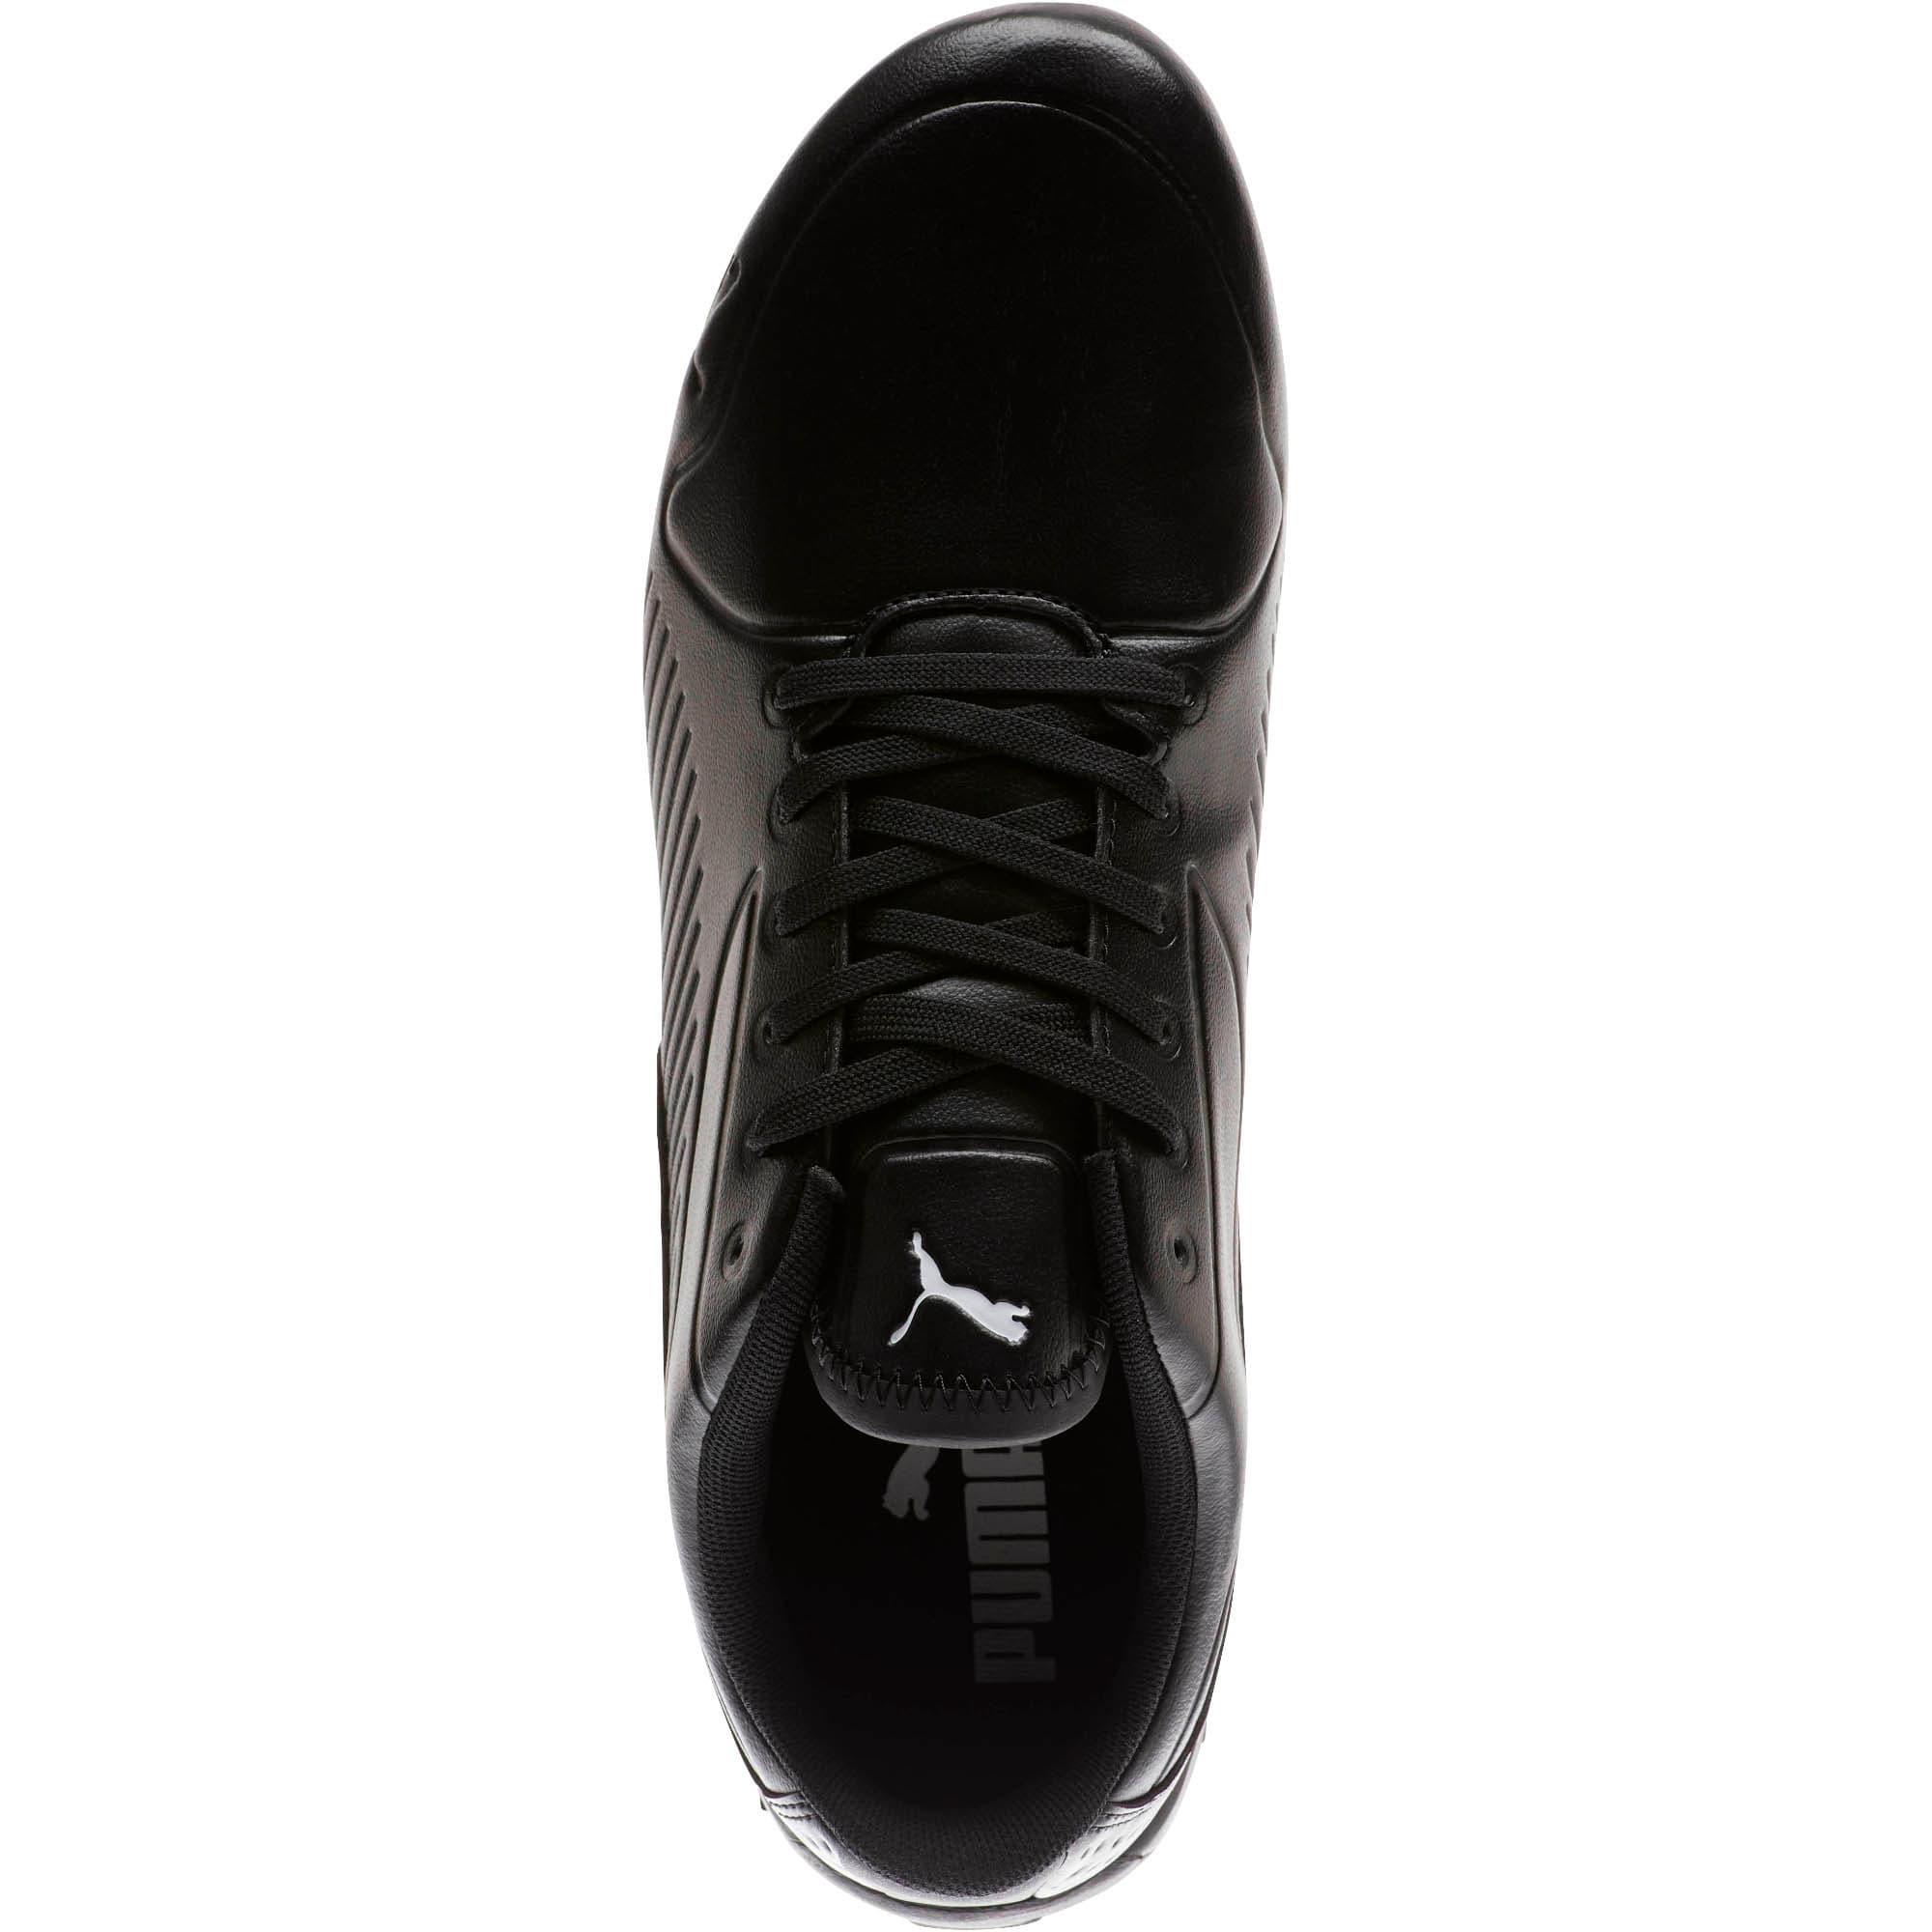 Thumbnail 5 of Drift Cat 7S Ultra Shoes, Puma Black-Puma Black, medium